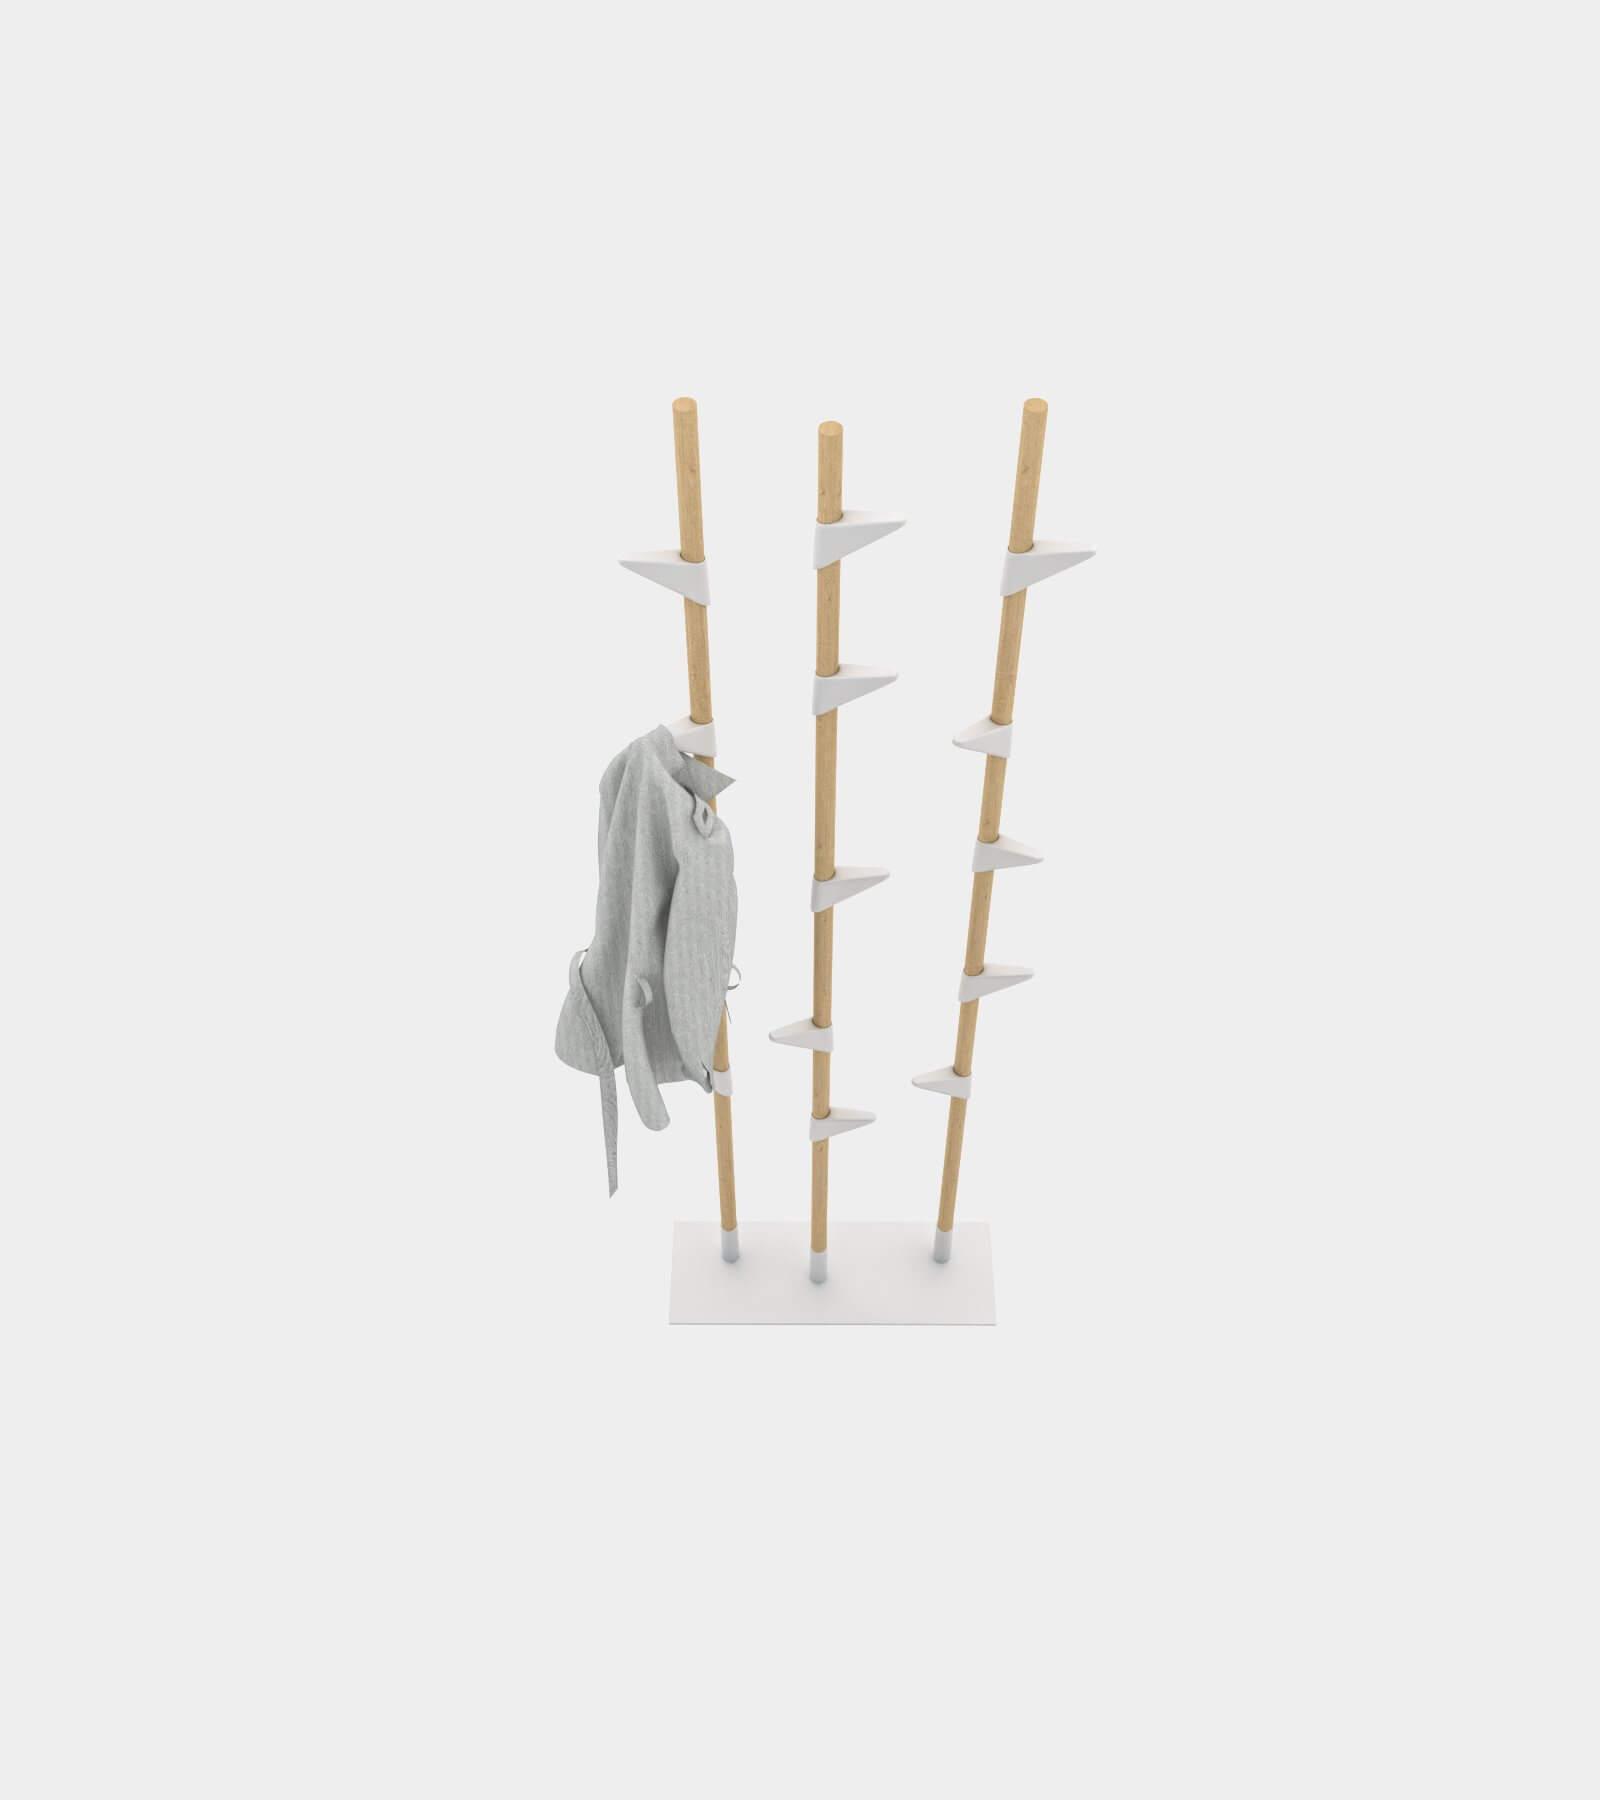 Free standing wardrobe 2 - 3D Model